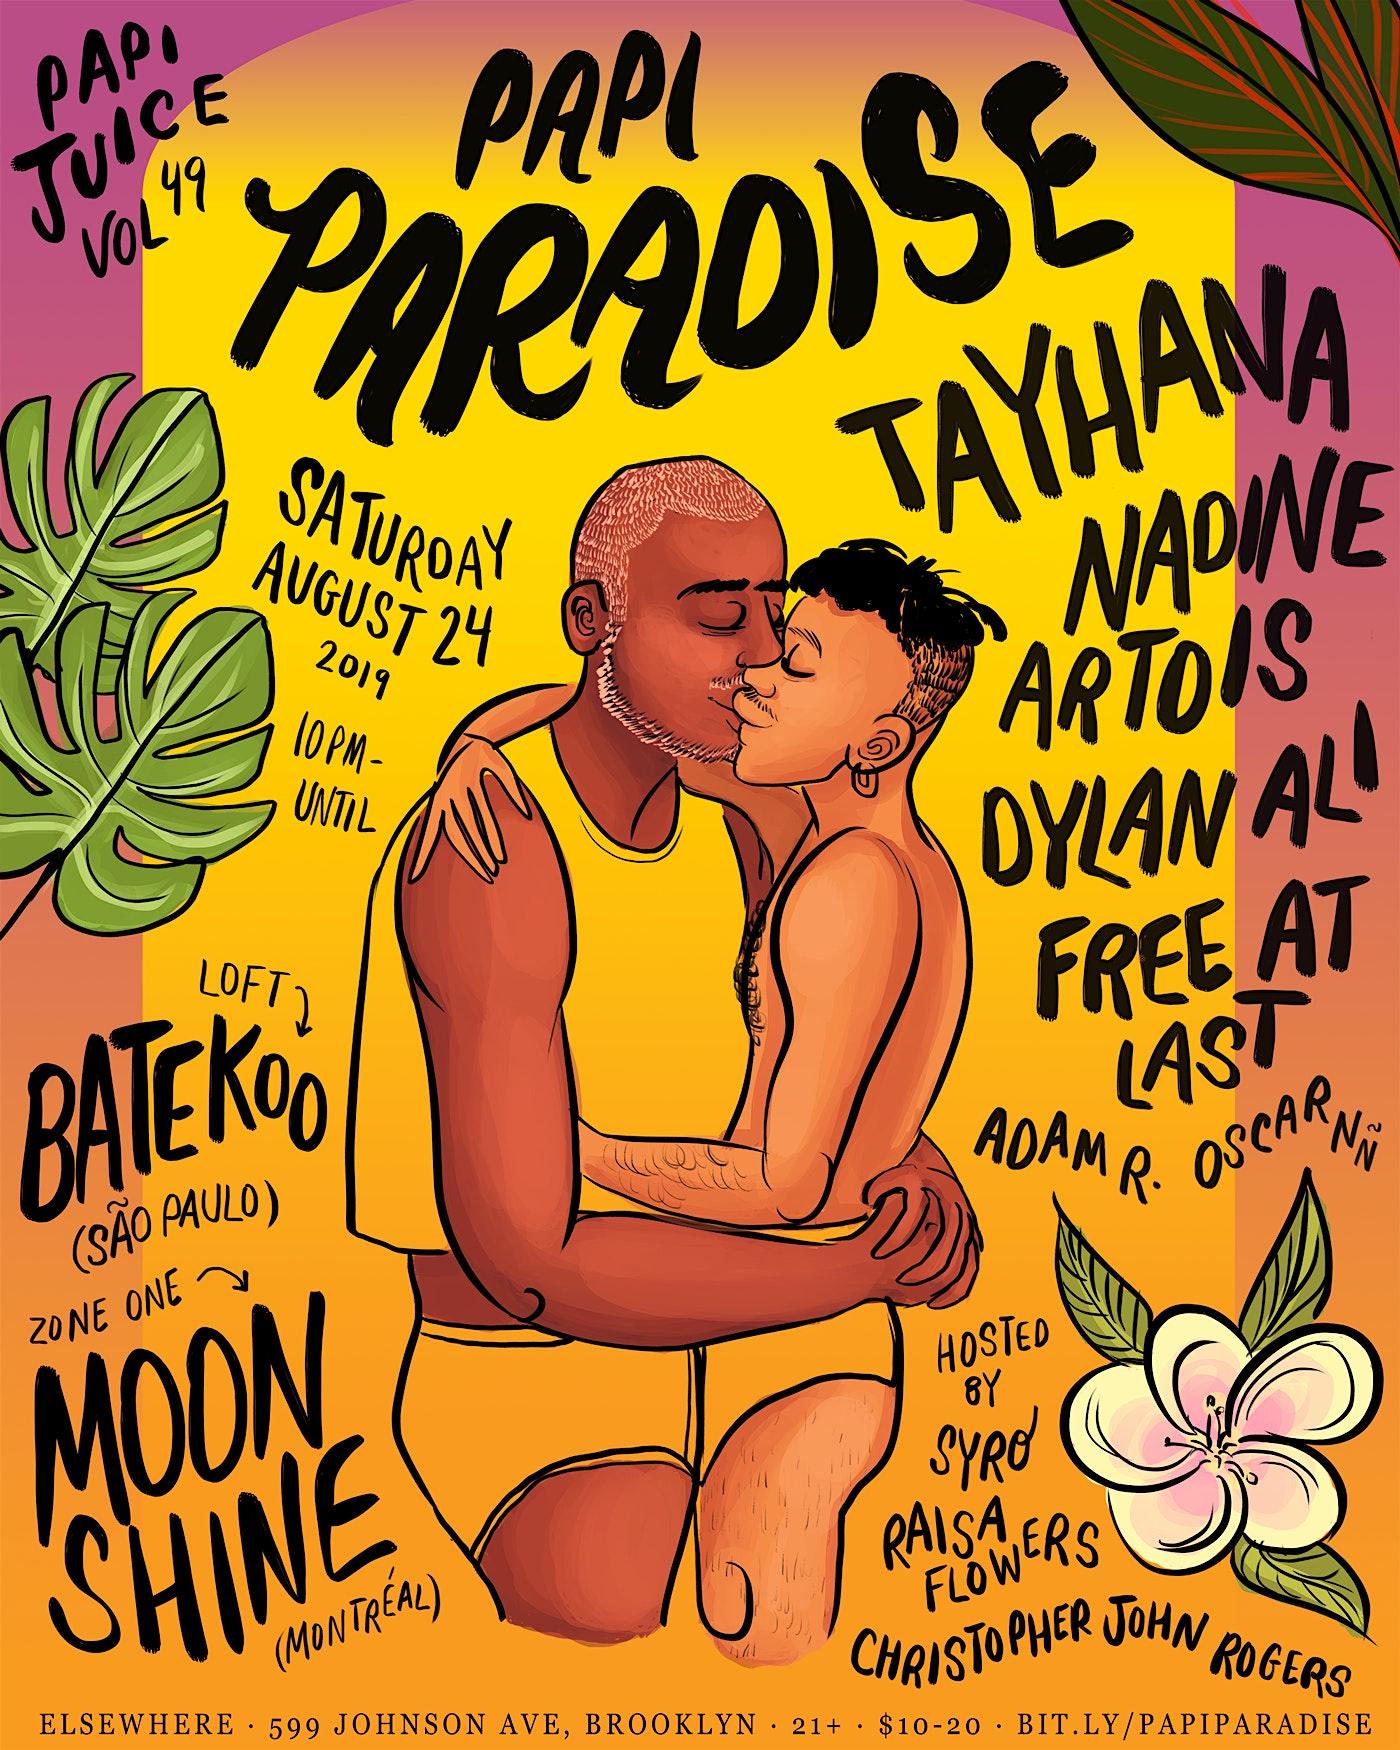 Papi Juice Vol. 49: Papi Paradise w/ Tayhana, Nadine Artois, Dylan Ali, Free At Last, Batekoo, Moon Shine and more